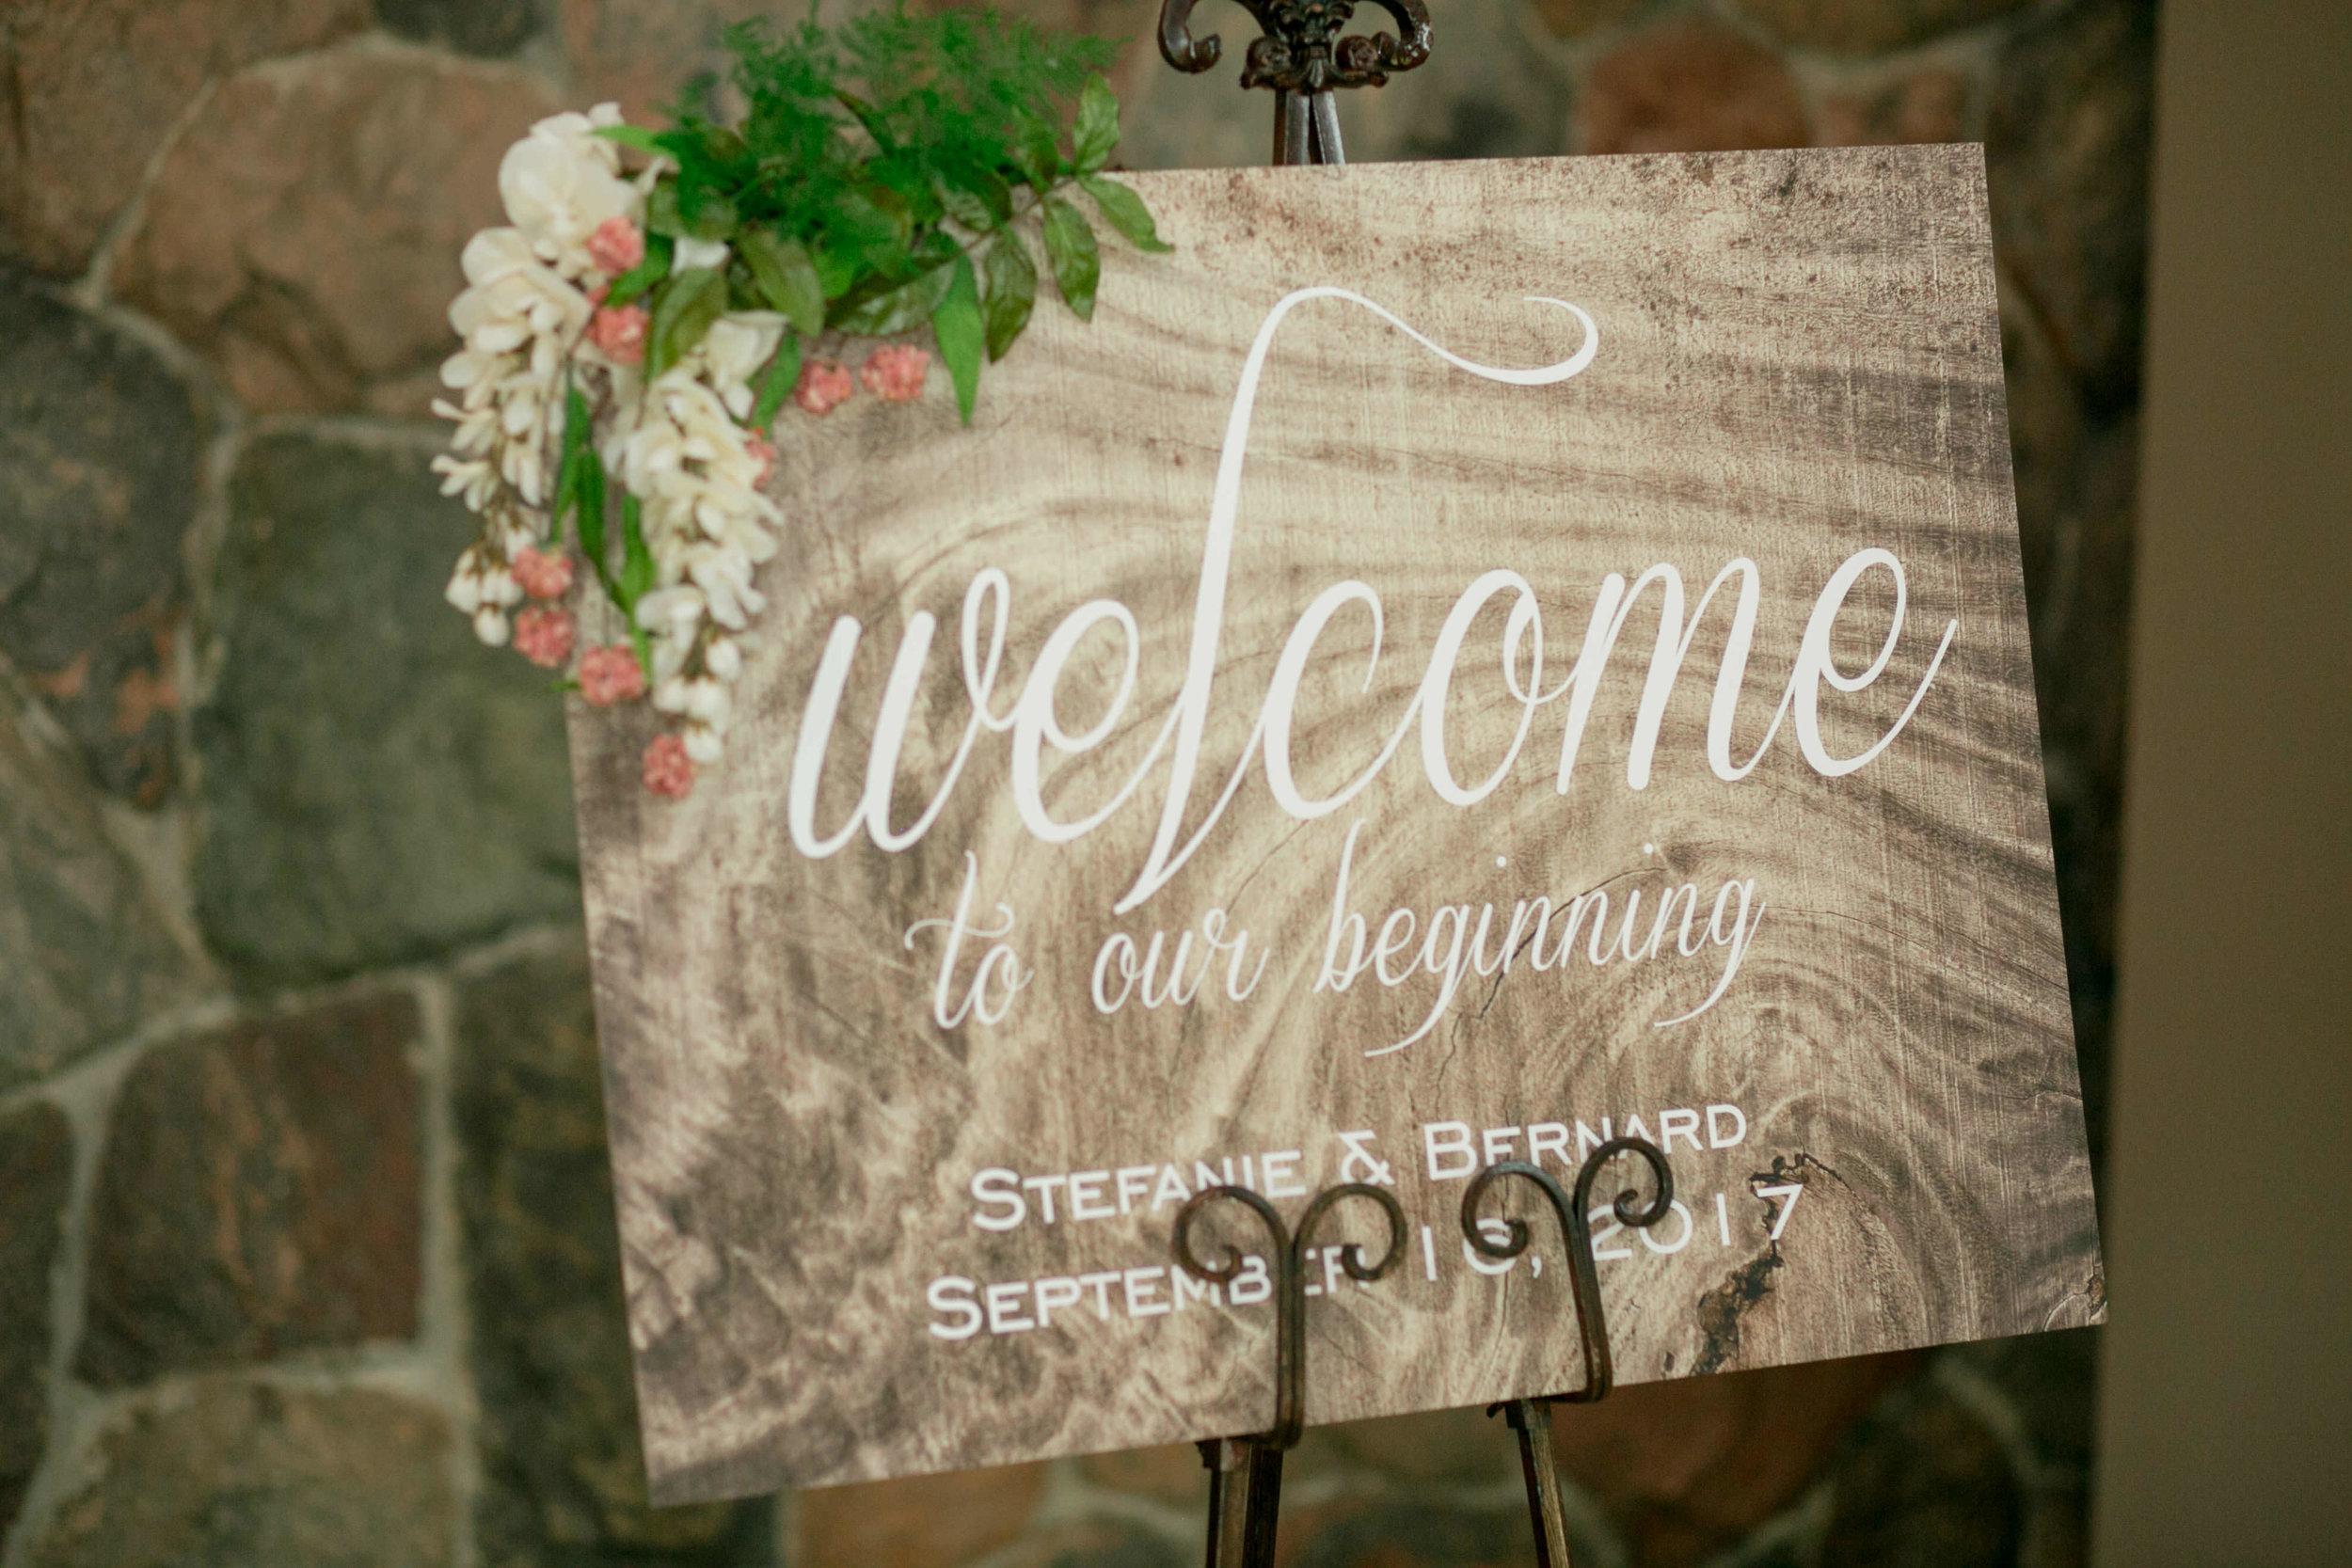 Stefanie___Bernard___Daniel_Ricci_Weddings_High_Res._Finals__391.jpg